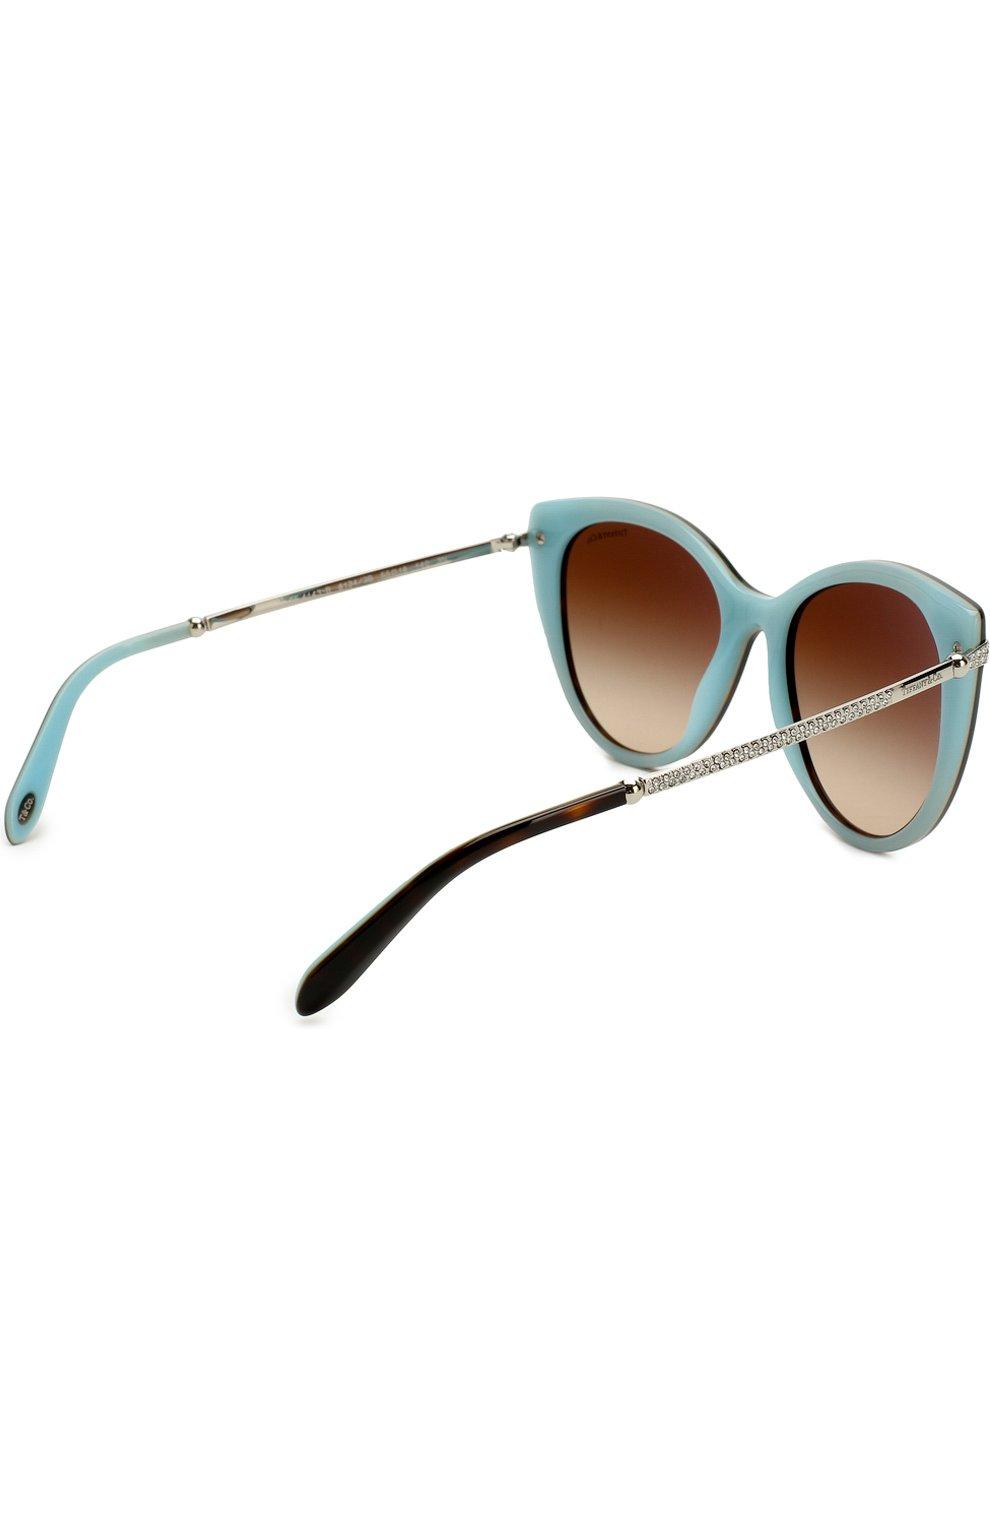 Женские солнцезащитные очки TIFFANY & CO. разноцветного цвета, арт. 4143B-81343B | Фото 4